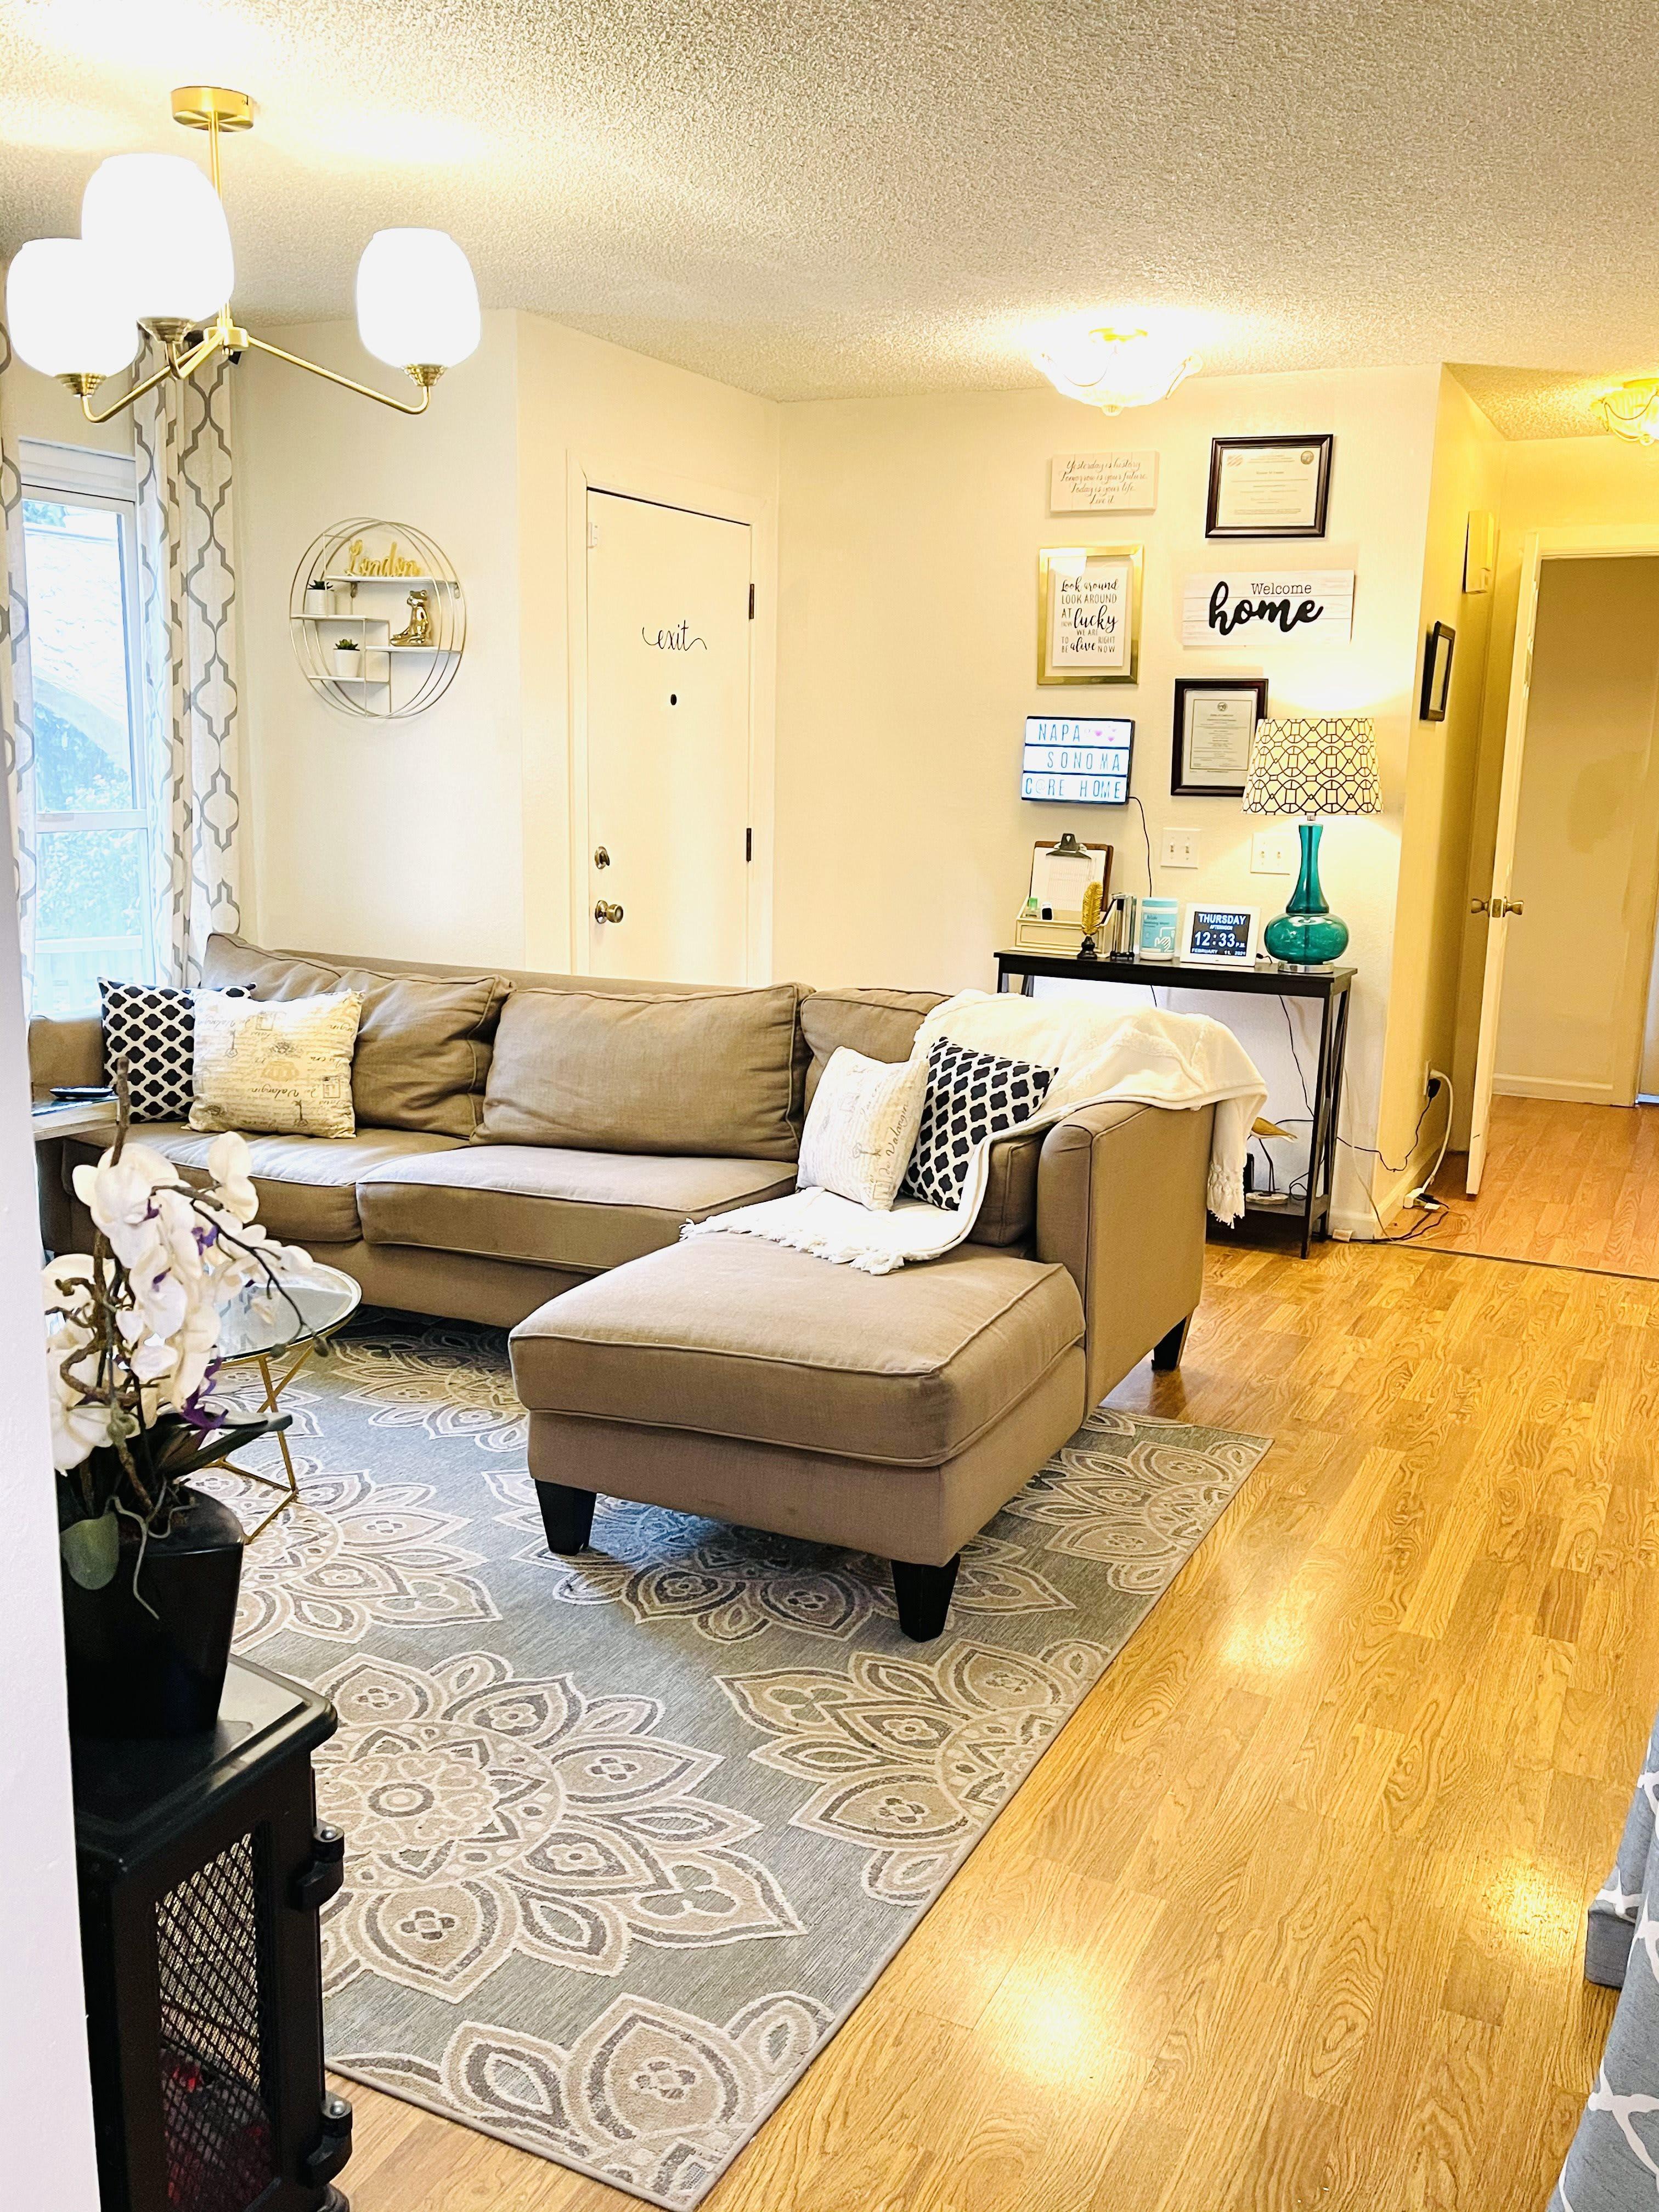 Photo 1 of Napa-Sonoma Quality Care Home, LLC